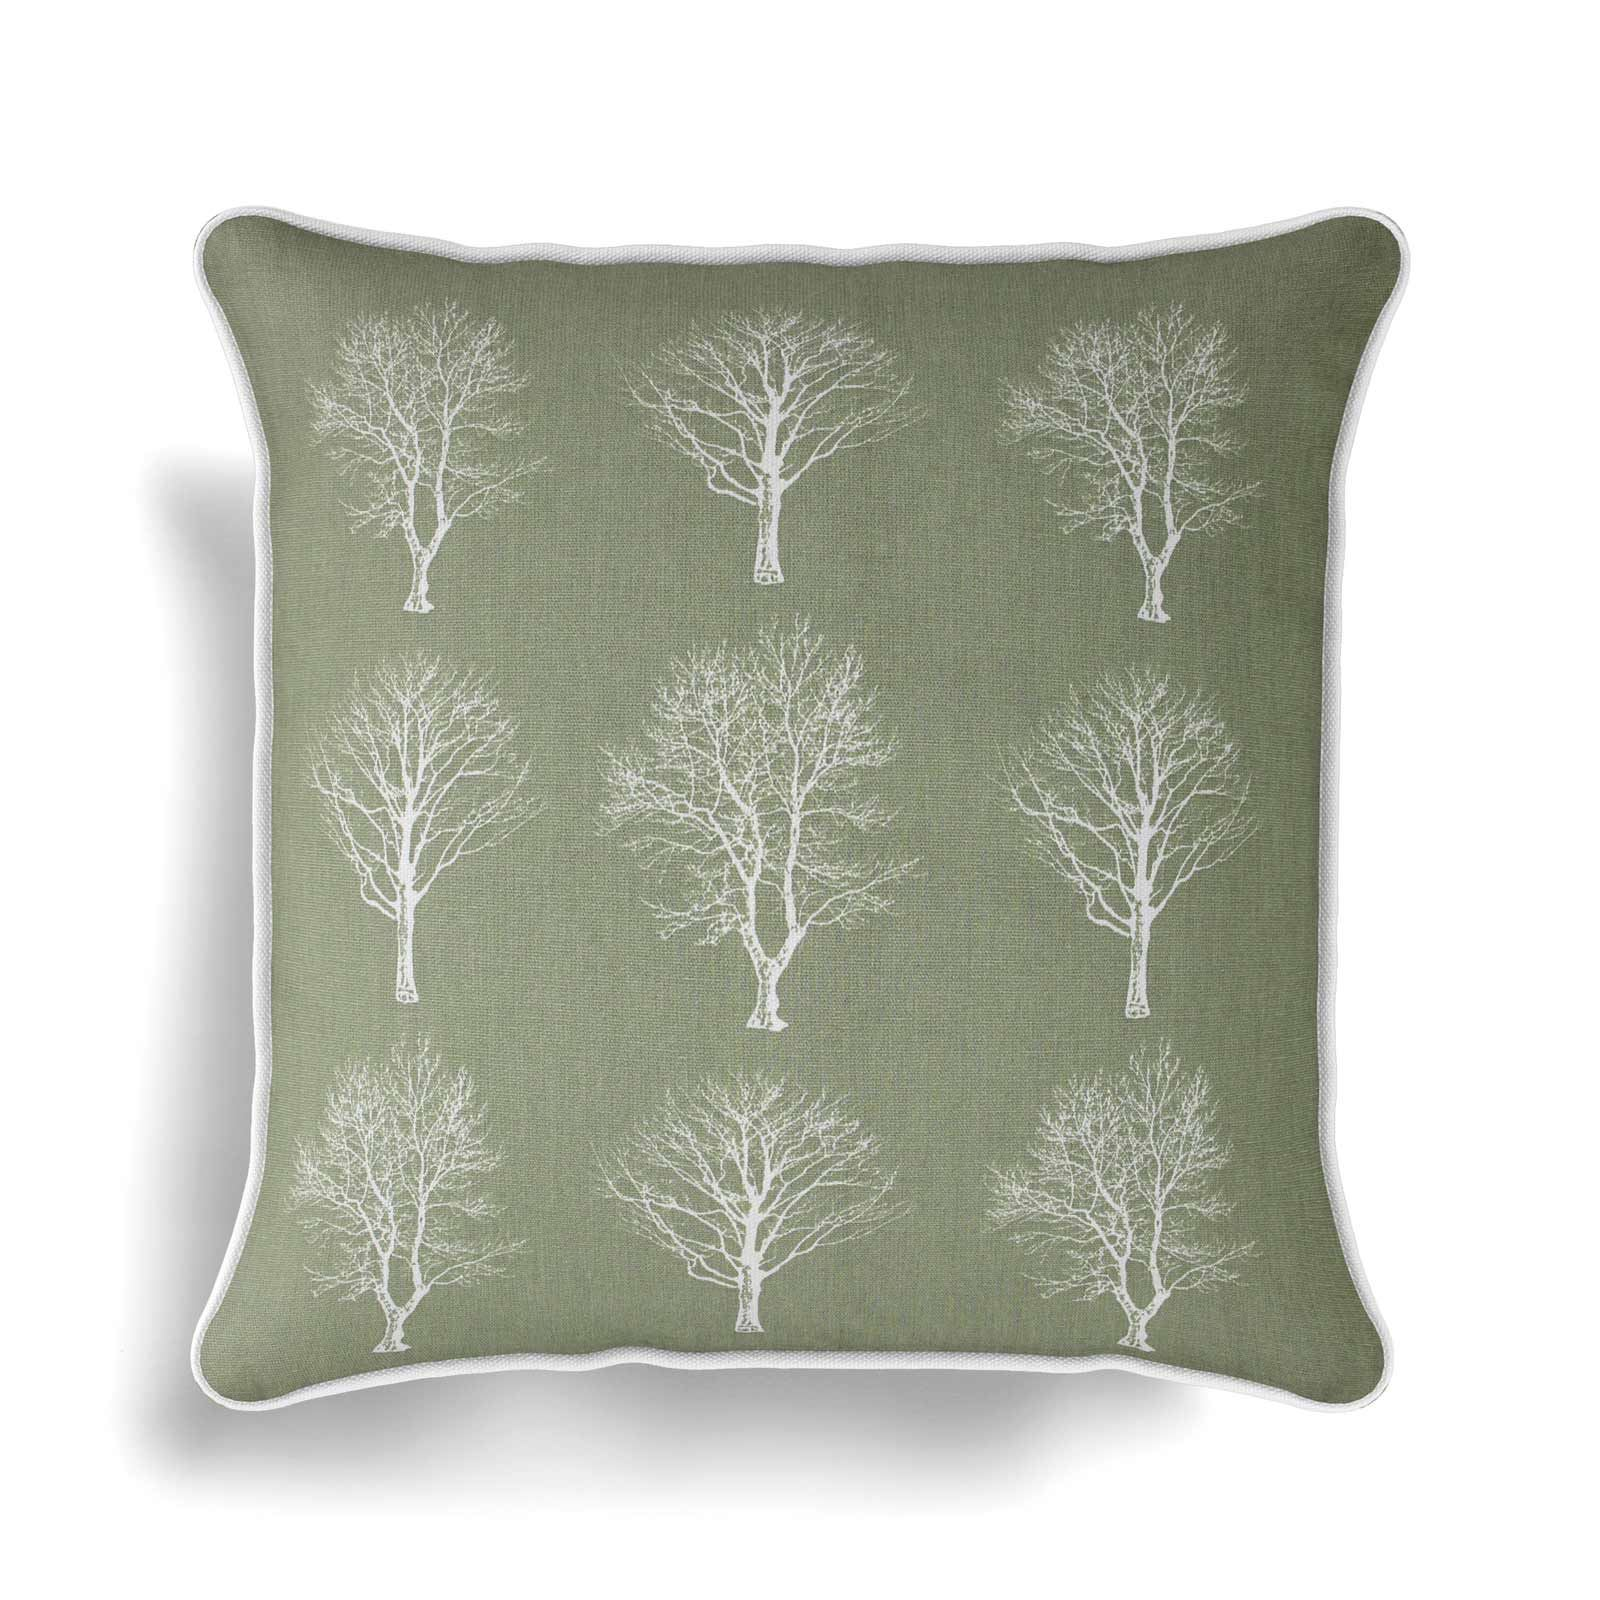 Woodland-Trees-Cushion-Cover-Modern-Reversible-Tree-Print-Covers-17-034-x-17-034 thumbnail 24